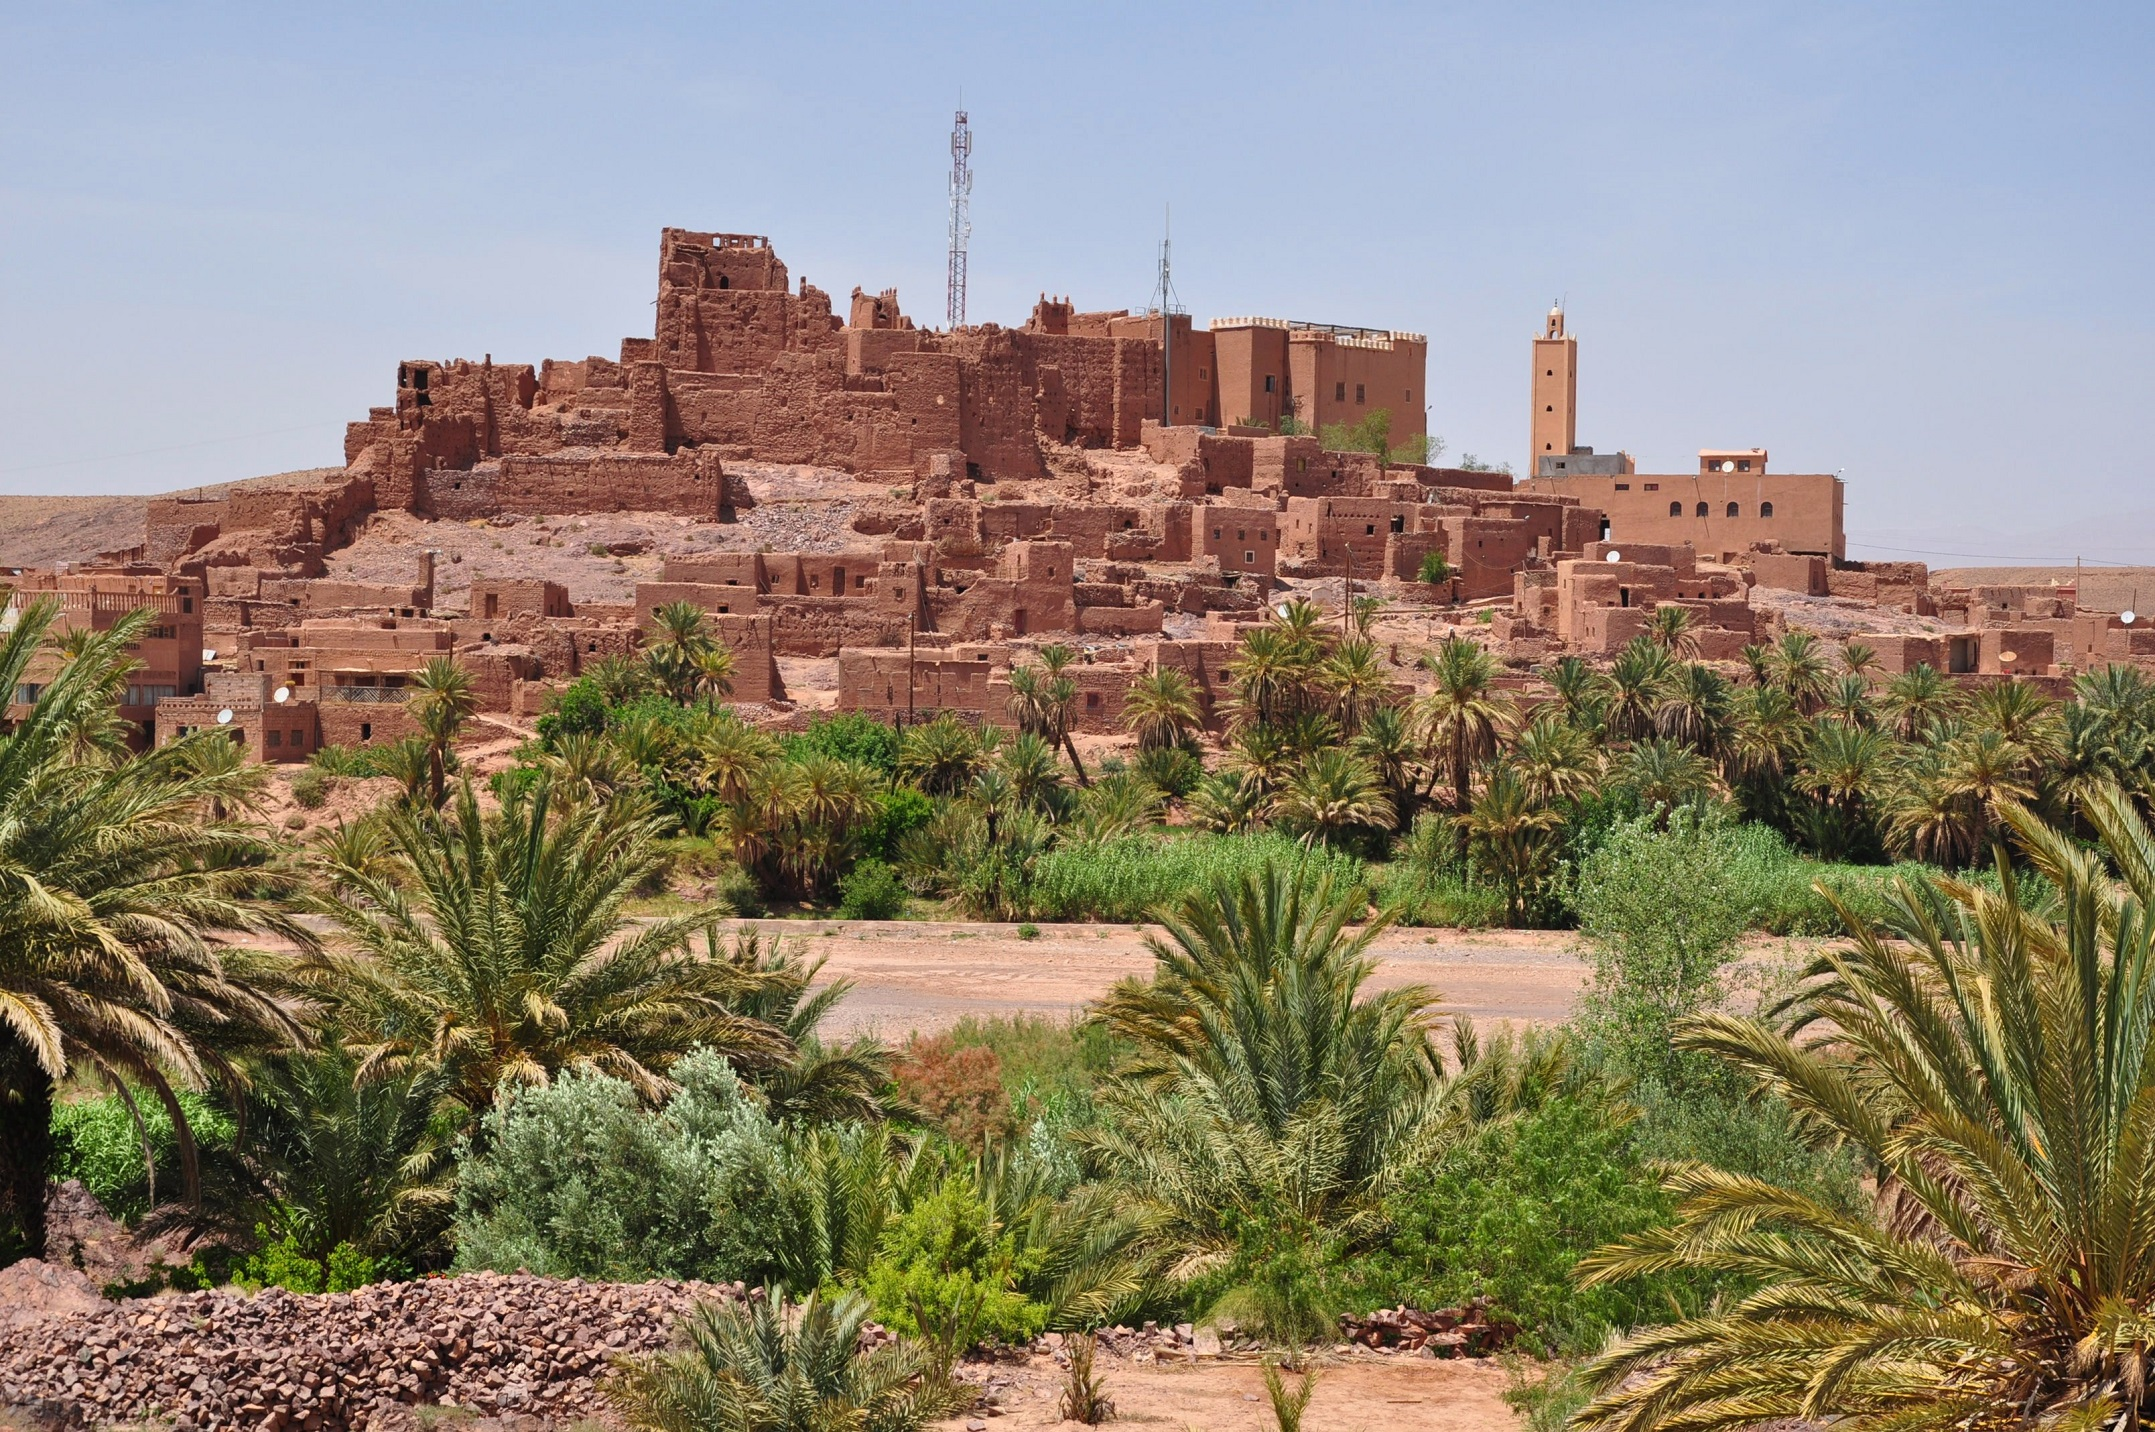 Ouarzazate Morocco  city images : Morocco, Souss Massa Draa Region, Ouarzazate Province, Kasbah ...